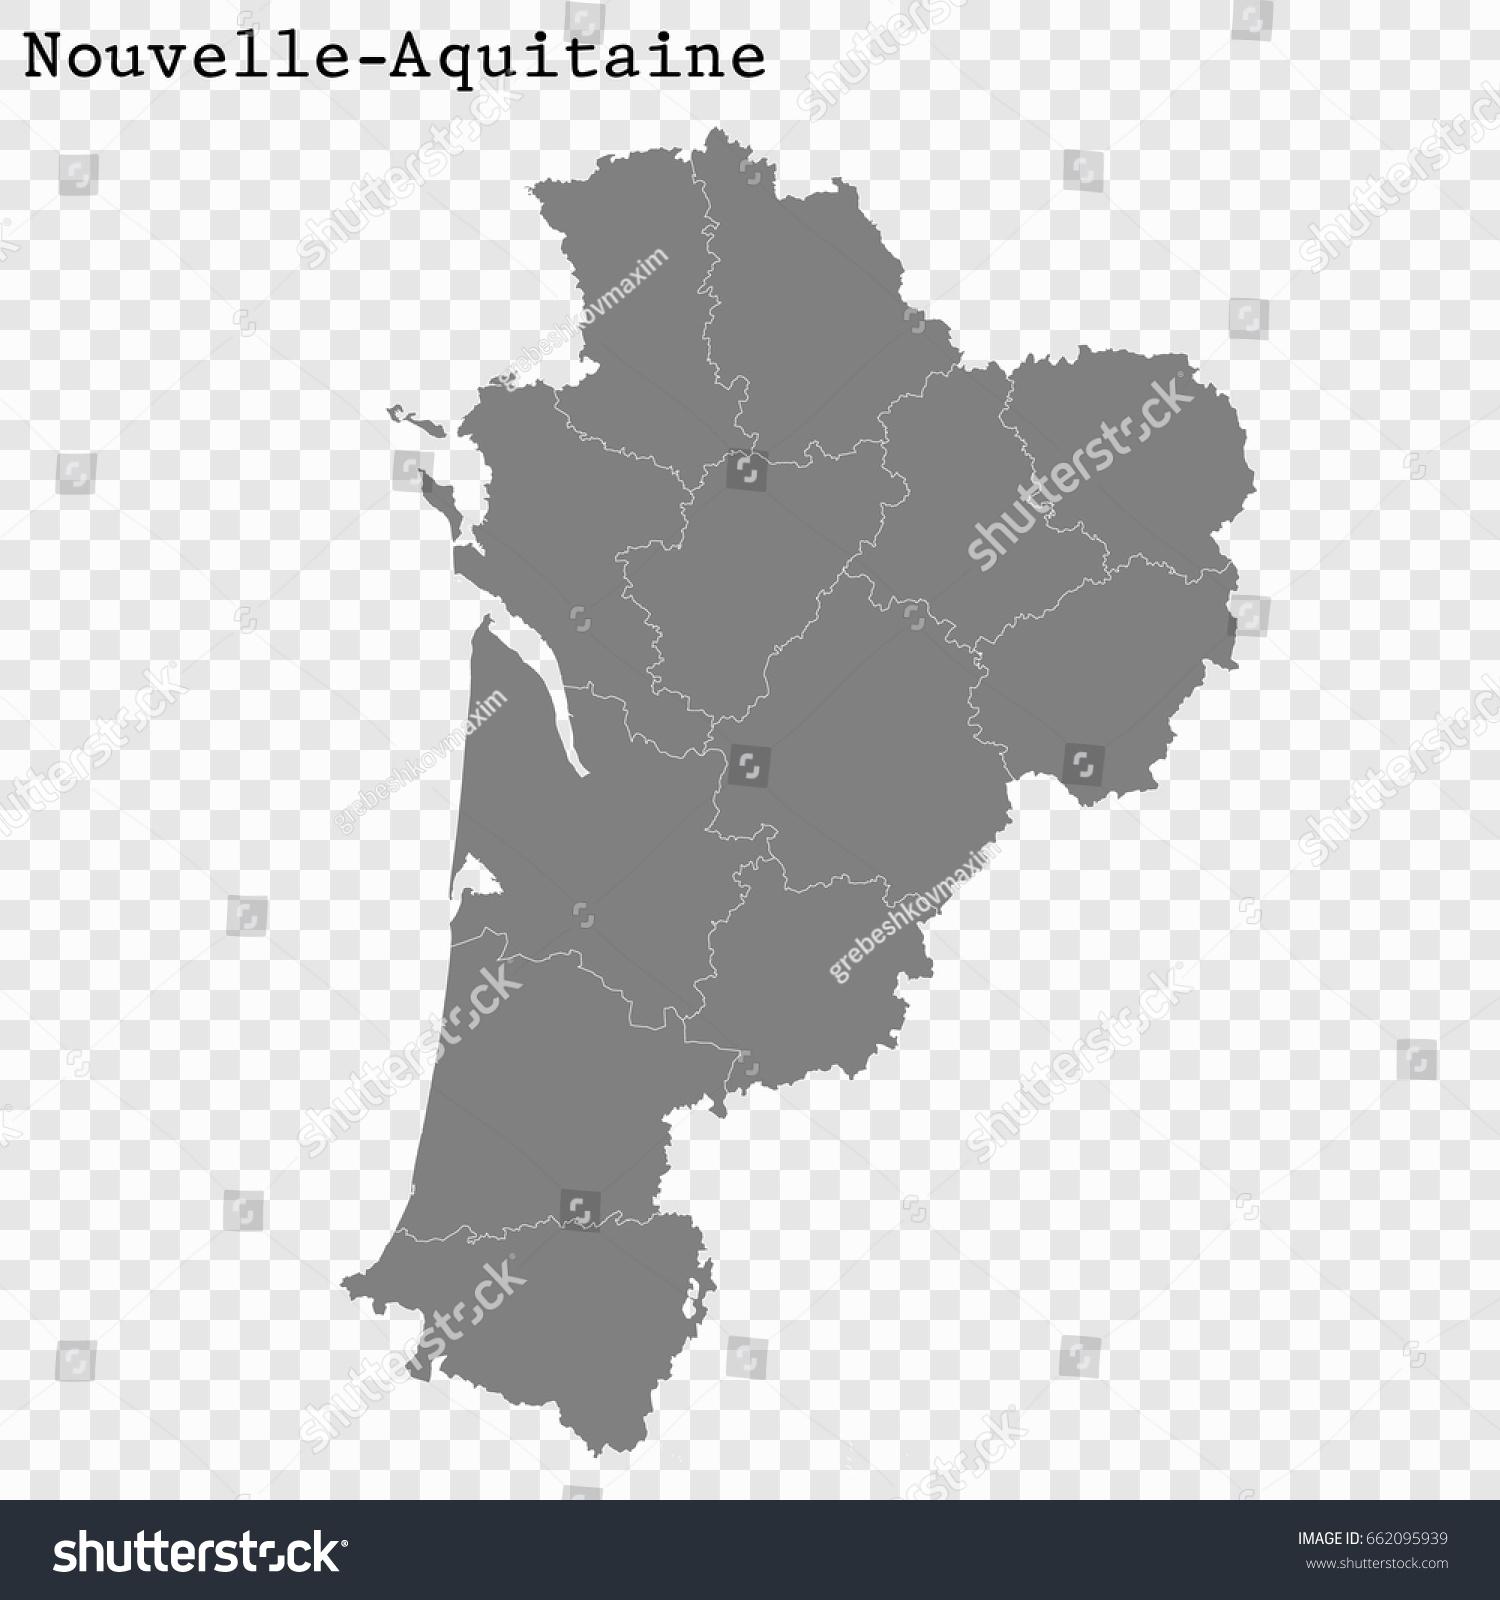 High Quality Map Nouvelleaquitaine Region France Stock Image avec Nouvelle Region France